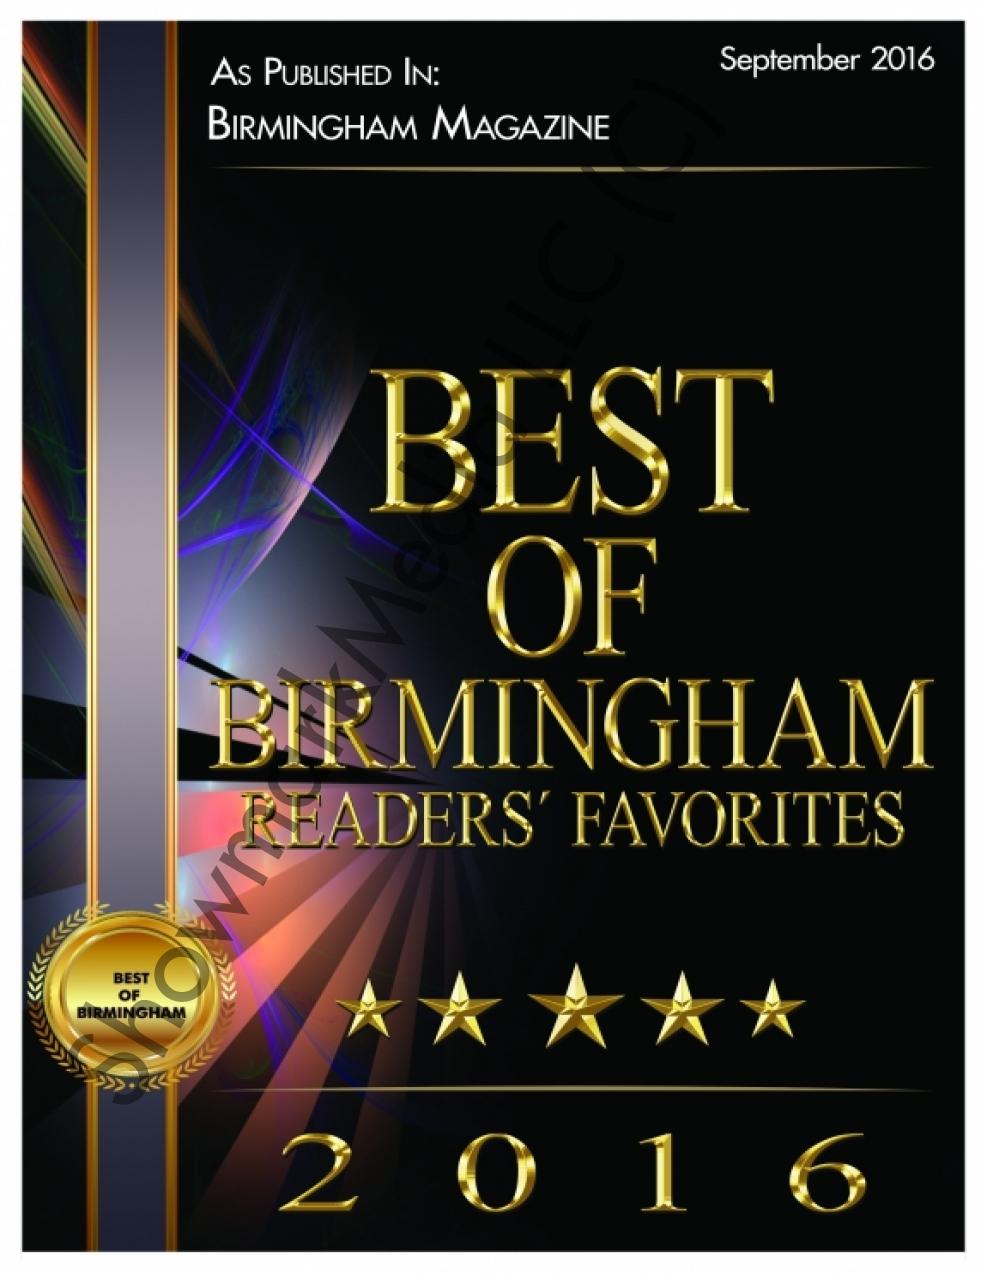 Best of Birmingham 2016